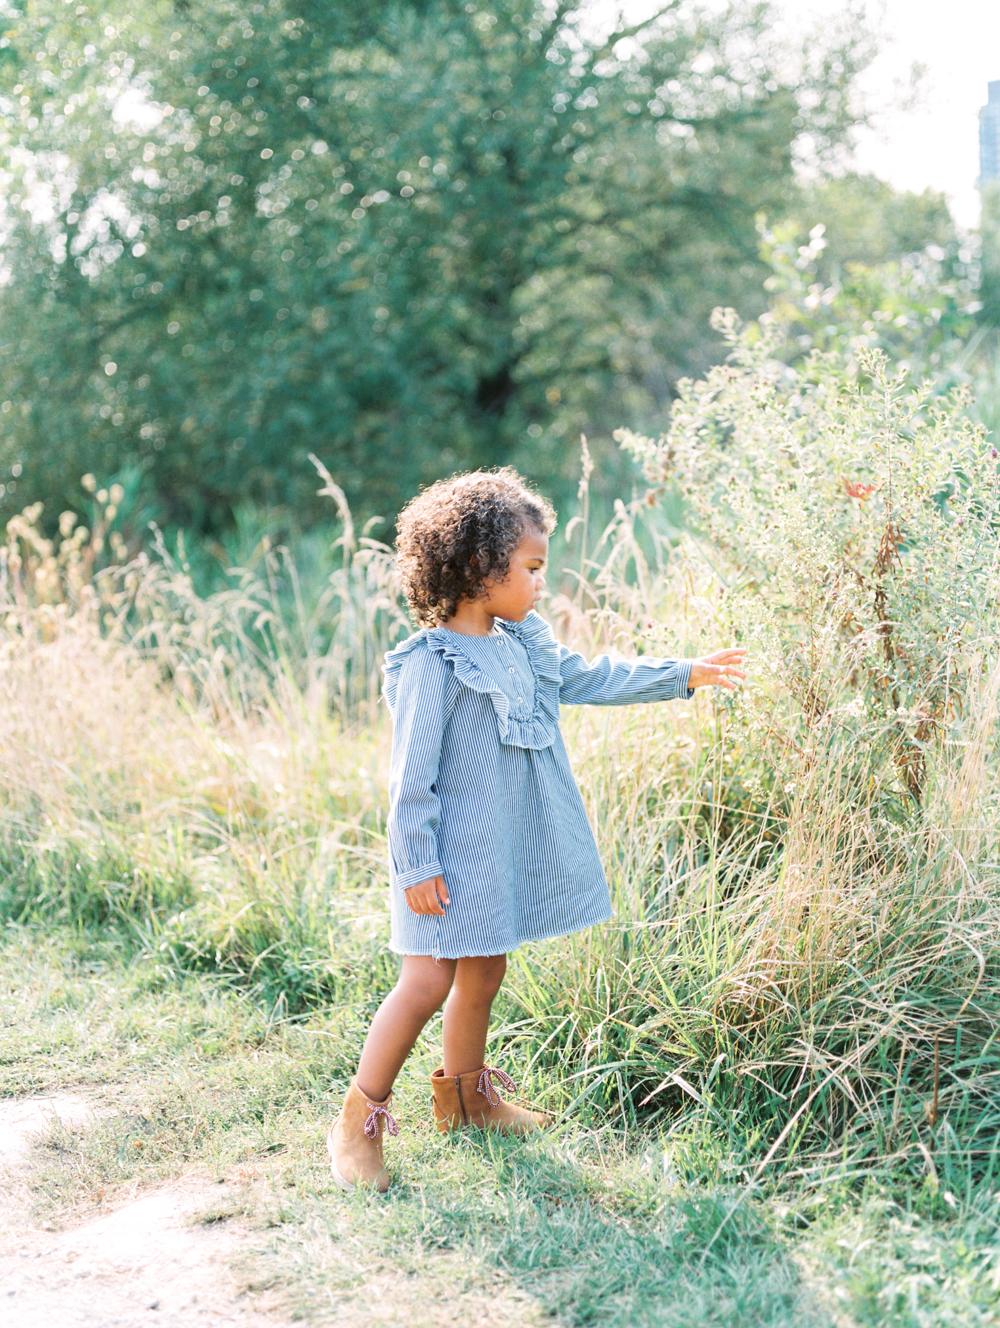 Elza Photographie - Marie-Lou (1000pxw)-21.jpg